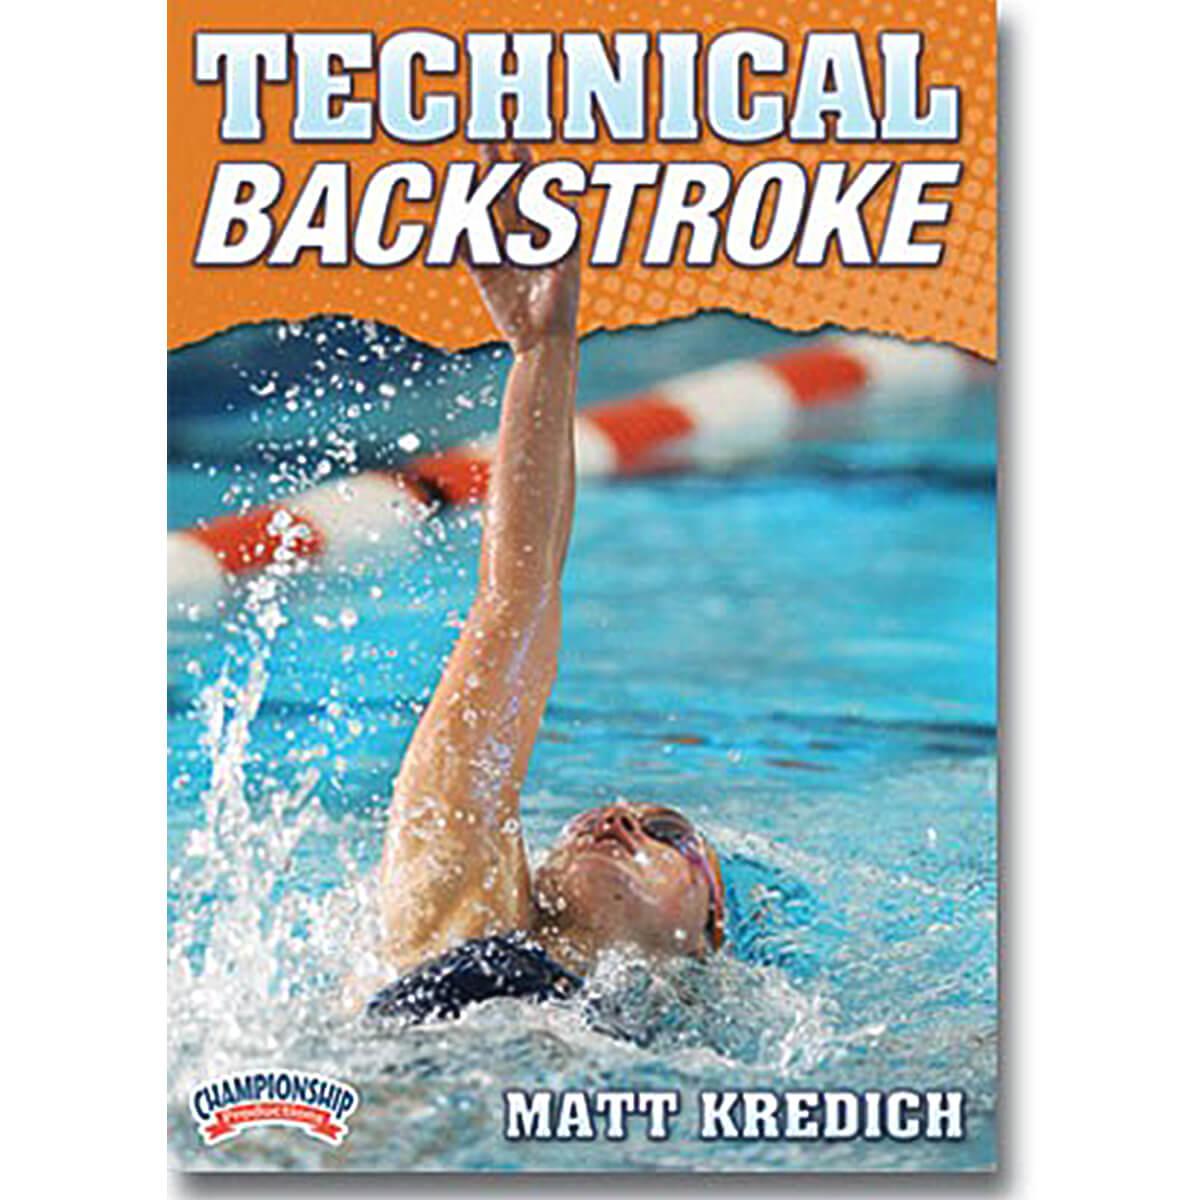 Championship DVD jacket video on technical backstroke